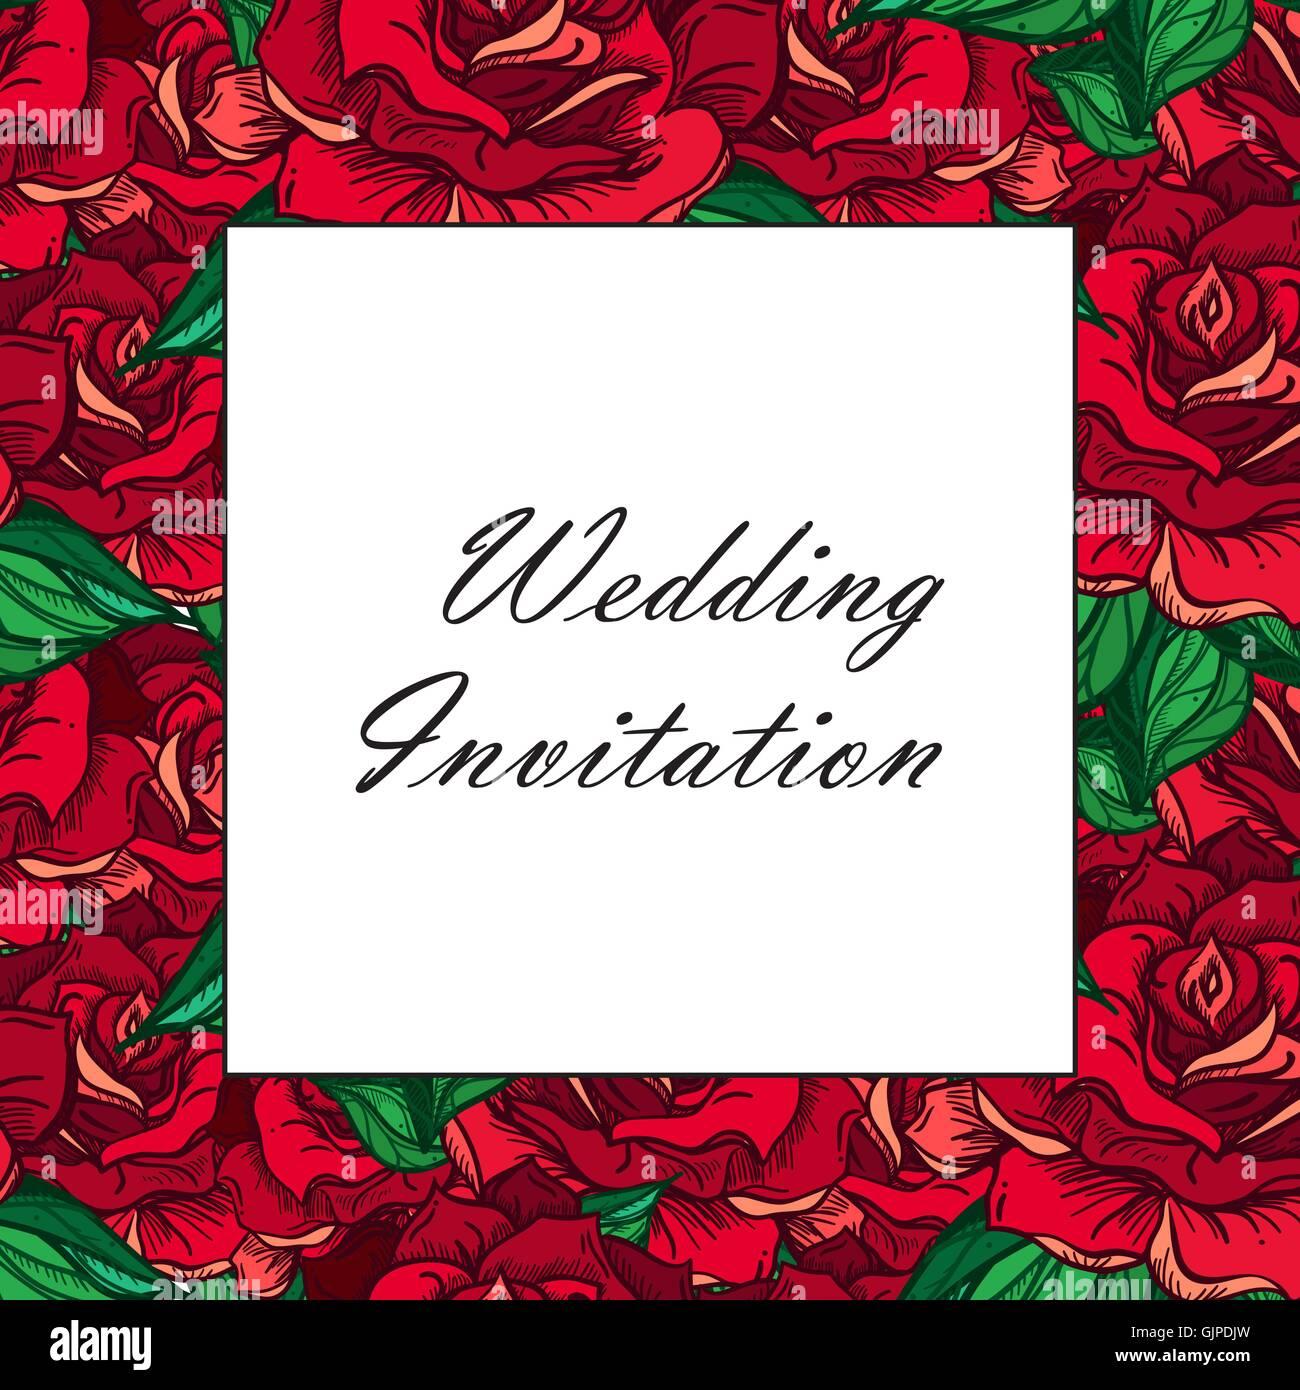 Hand Drawn Wedding Rose Frame. Flower Template for wedding, holiday ...